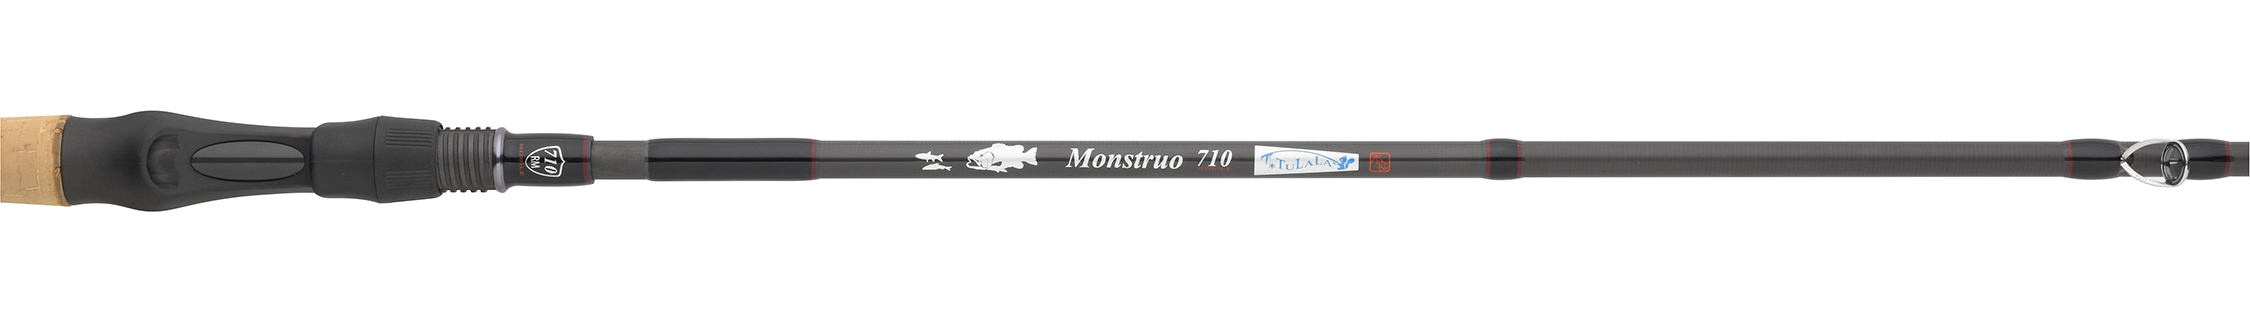 Monstruo710mobile | ロゴ